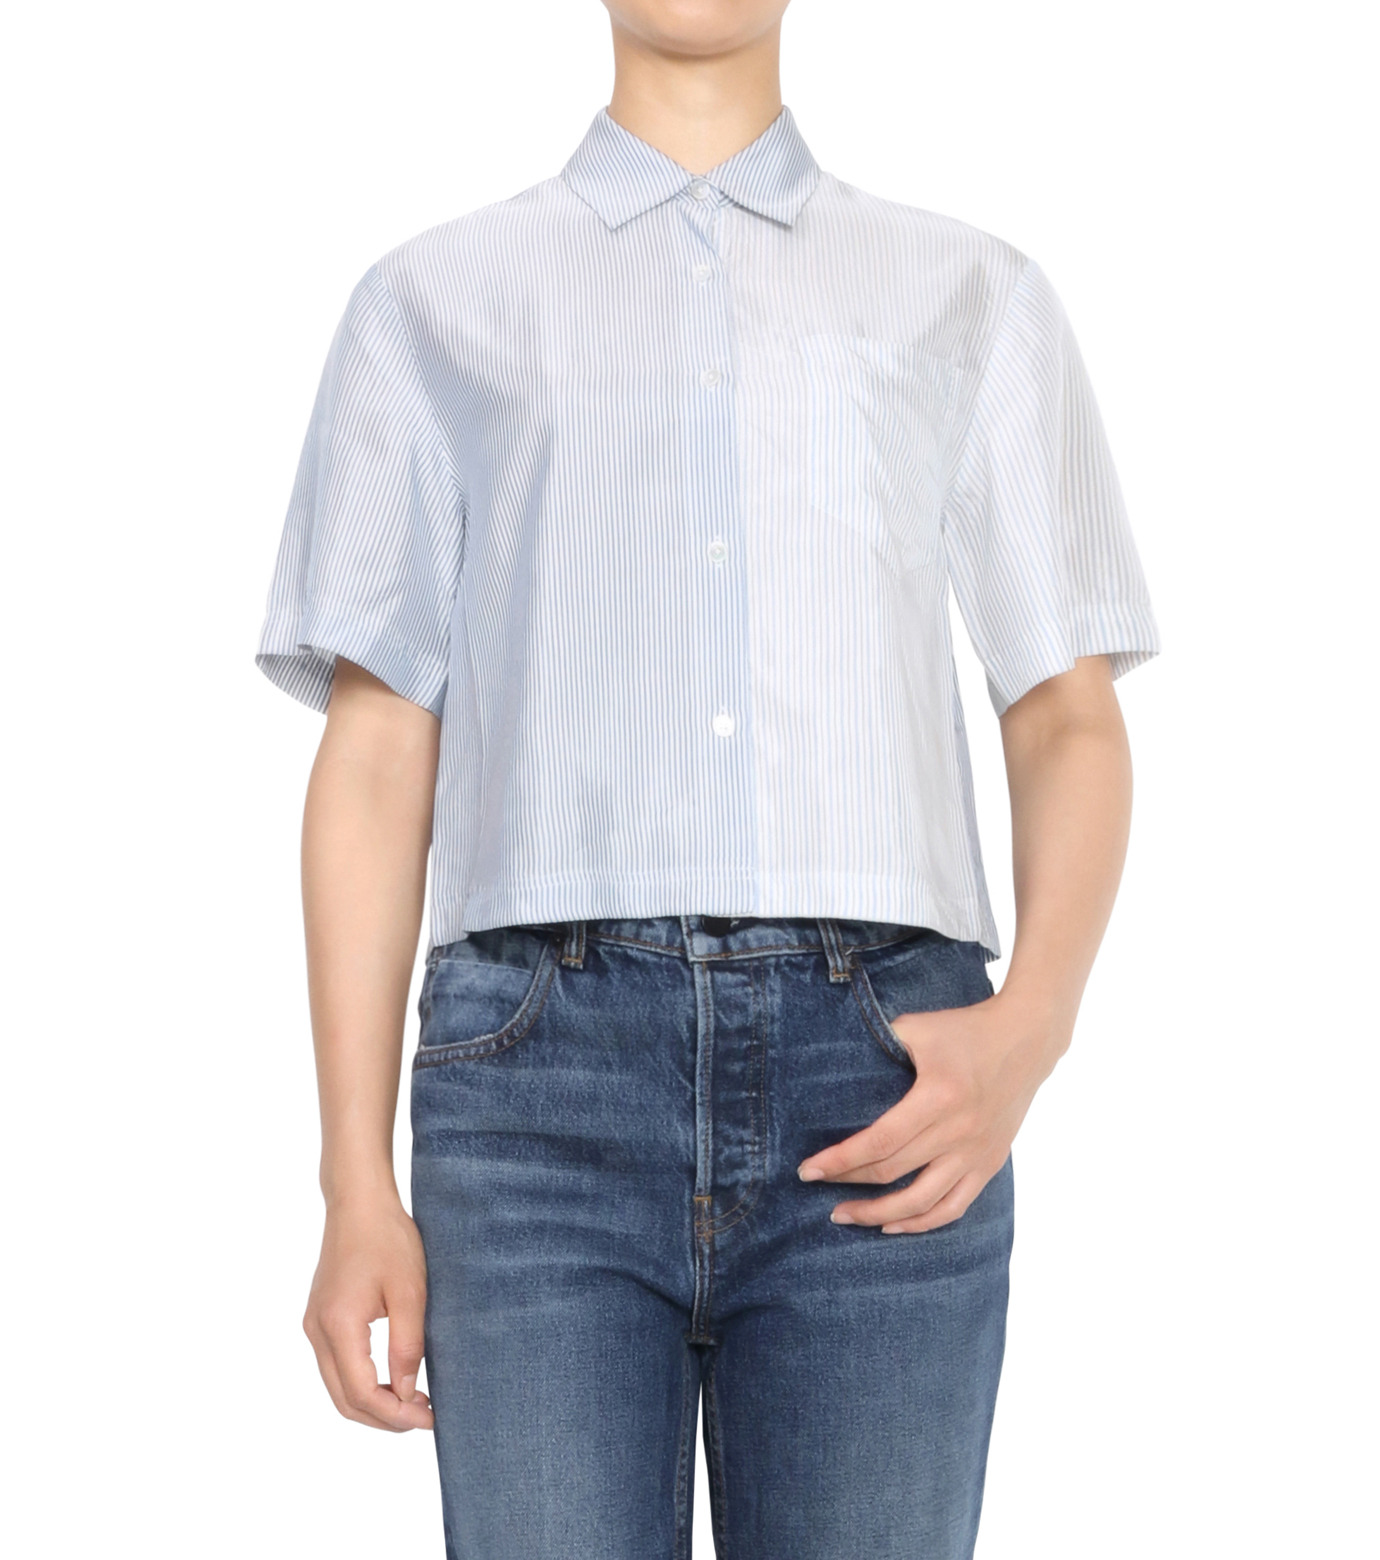 T by Alexander Wang(ティーバイ アレキサンダーワン)のWashed Stripe SS Shirt-NAVY(シャツ/shirt)-403202P16-93 拡大詳細画像1